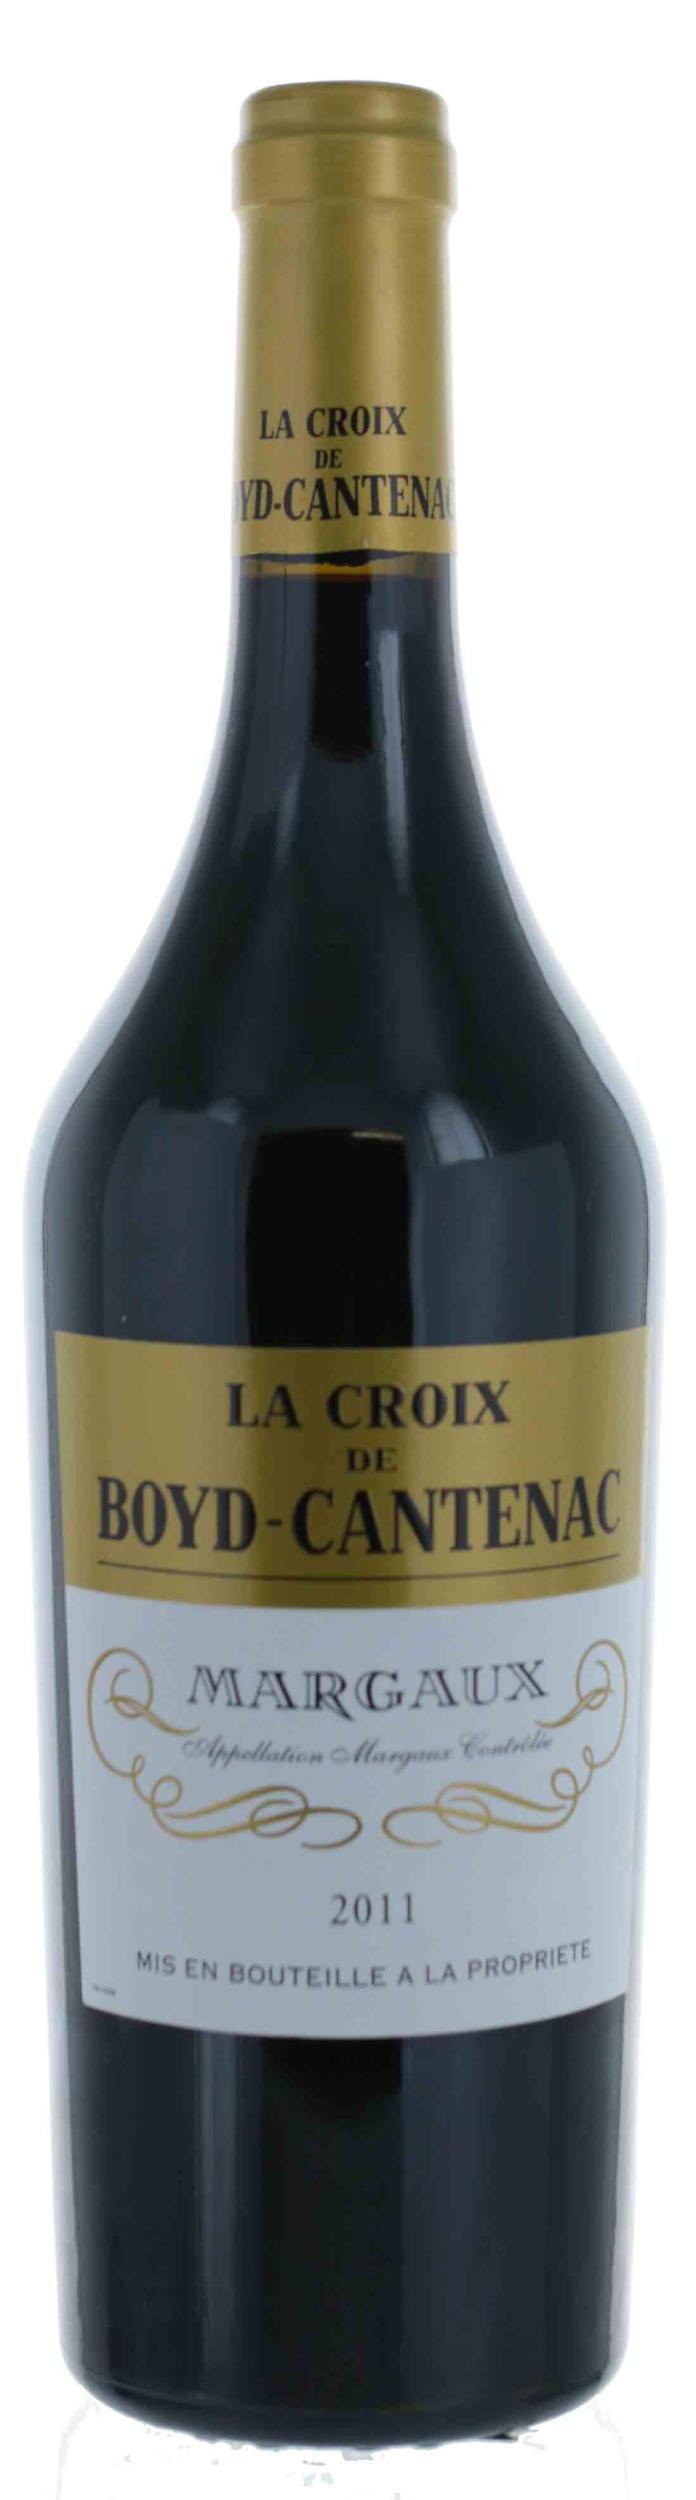 Margaux - La Croix de Boyd Cantenac - Château Boyd Cantenac - 2011